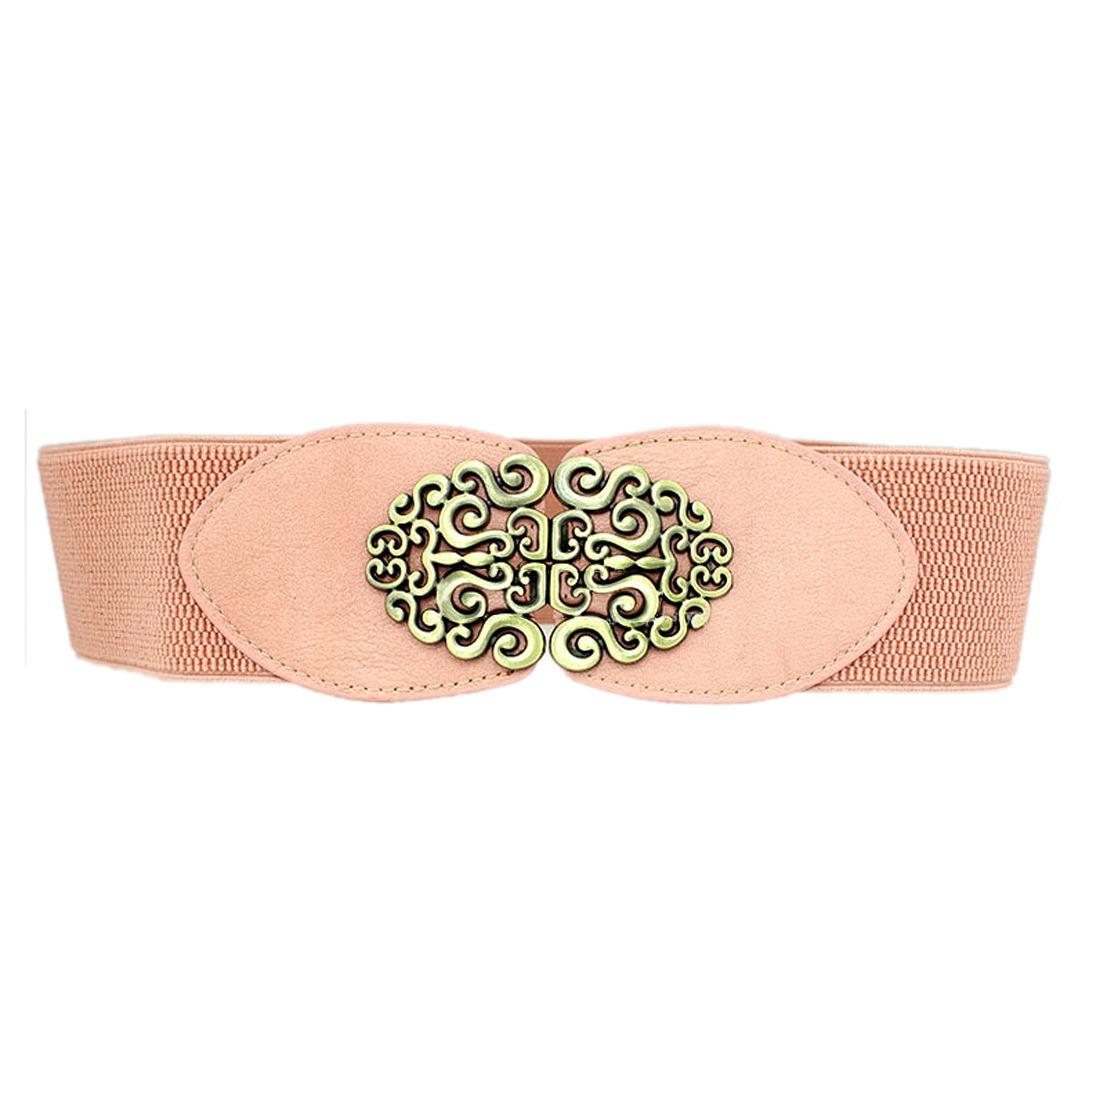 Retro Women Fashion Flower Buckle Waist Belt Wide Elastic Wide Waistband Belts